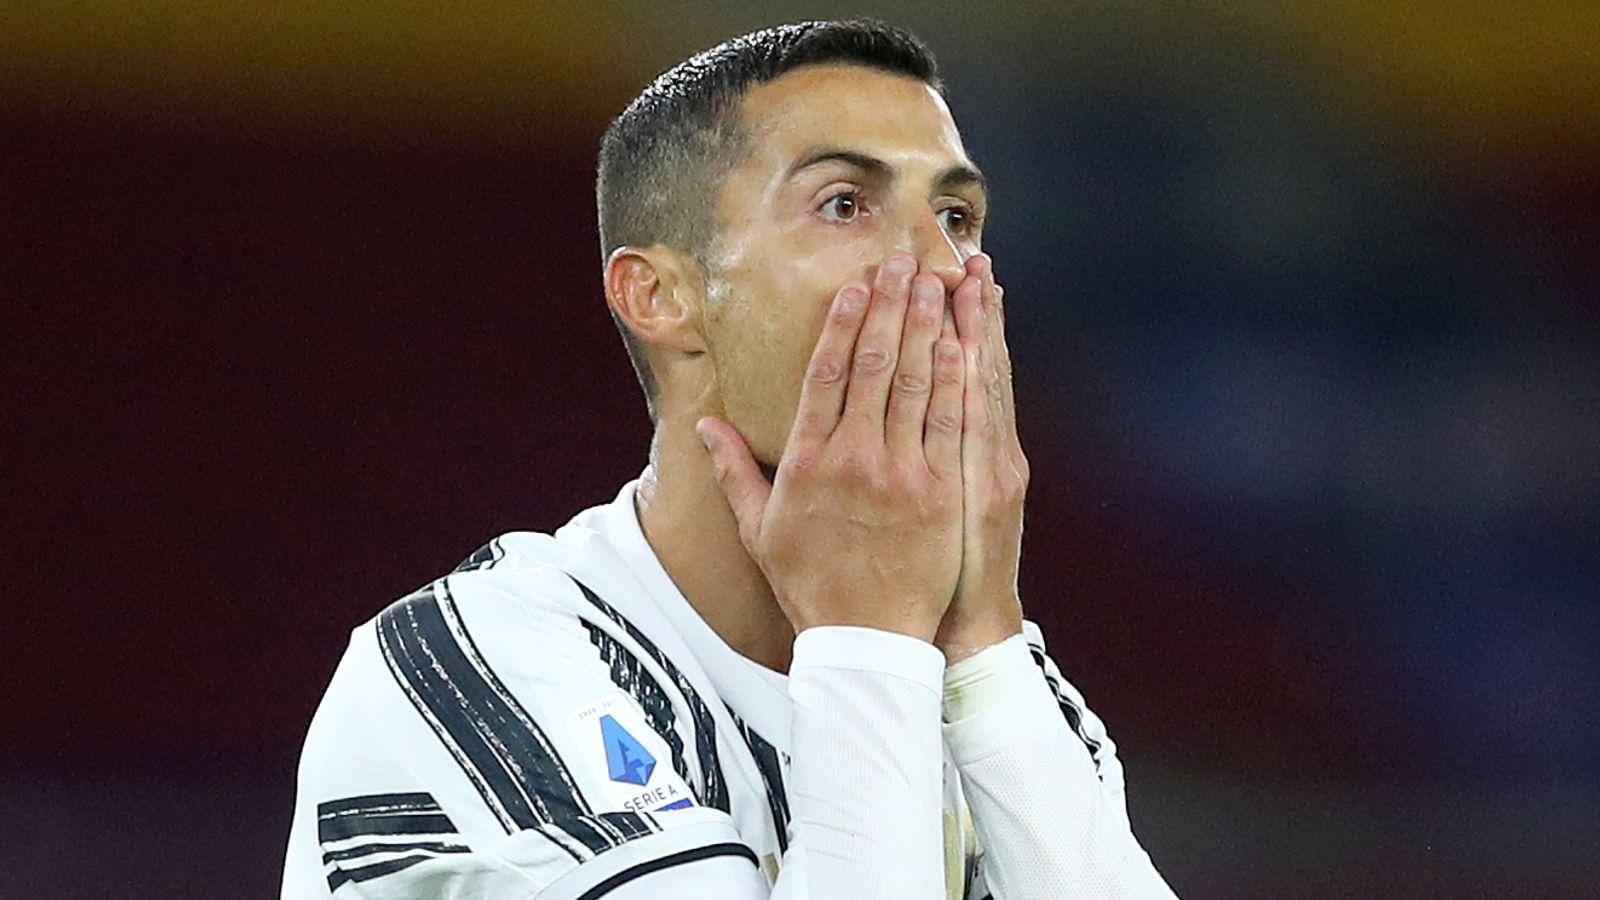 Chưa khỏi Covid-19, Cristiano Ronaldo bỏ lỡ trận Juventus - Barca